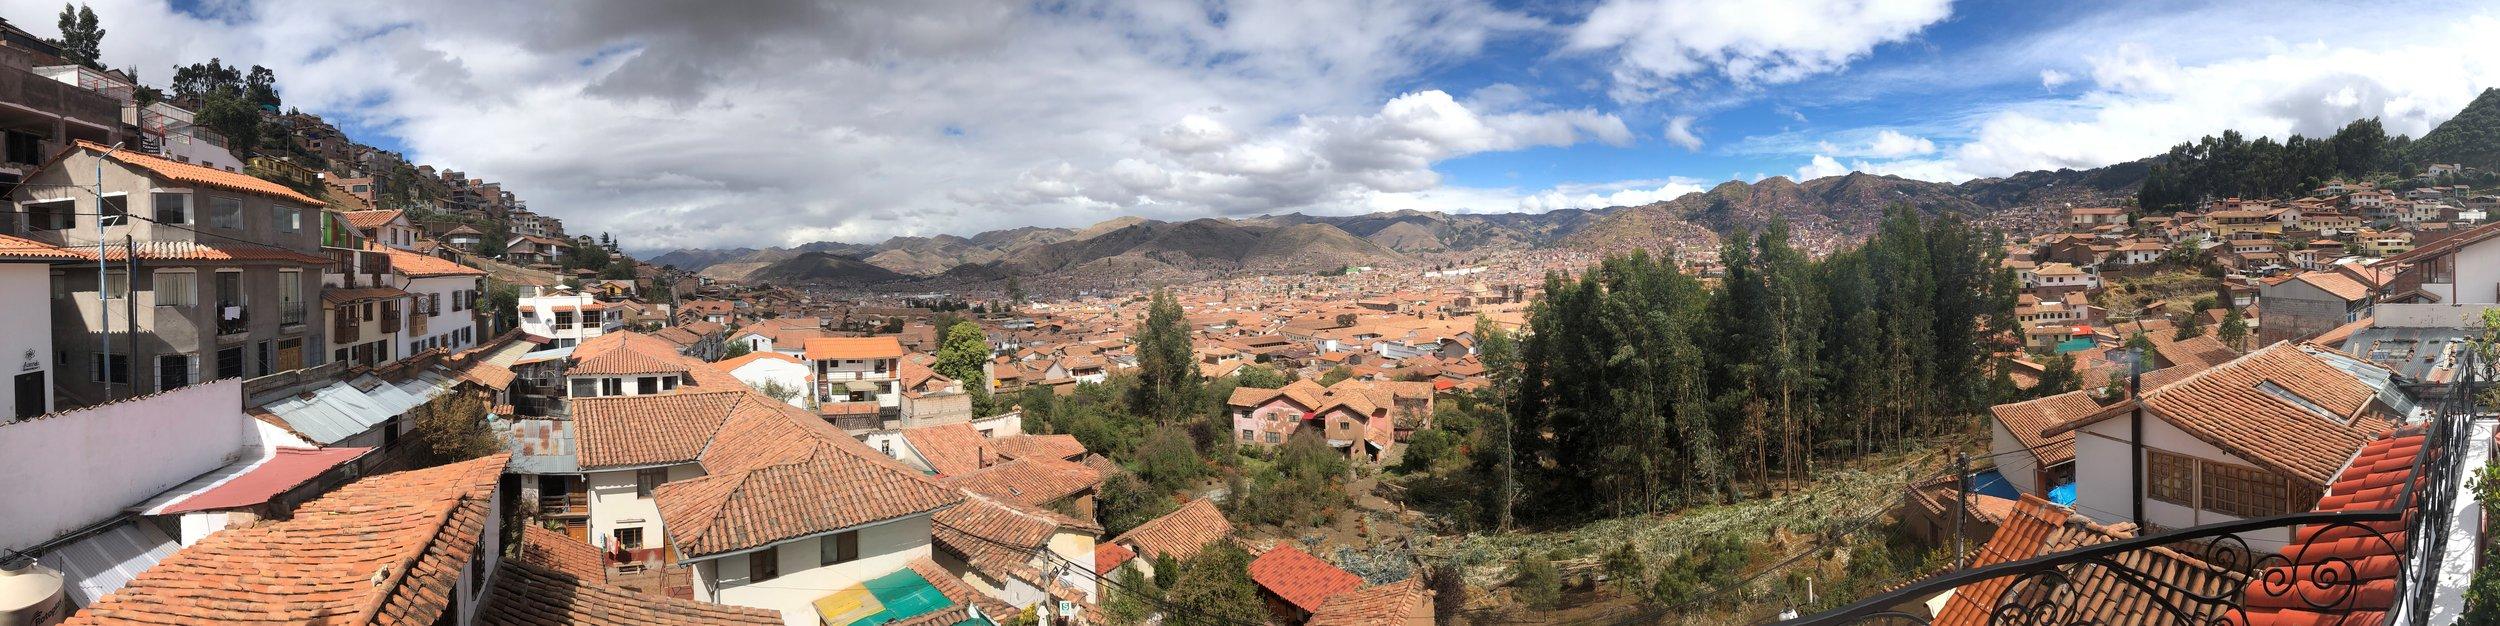 View of Cusco from San Blas